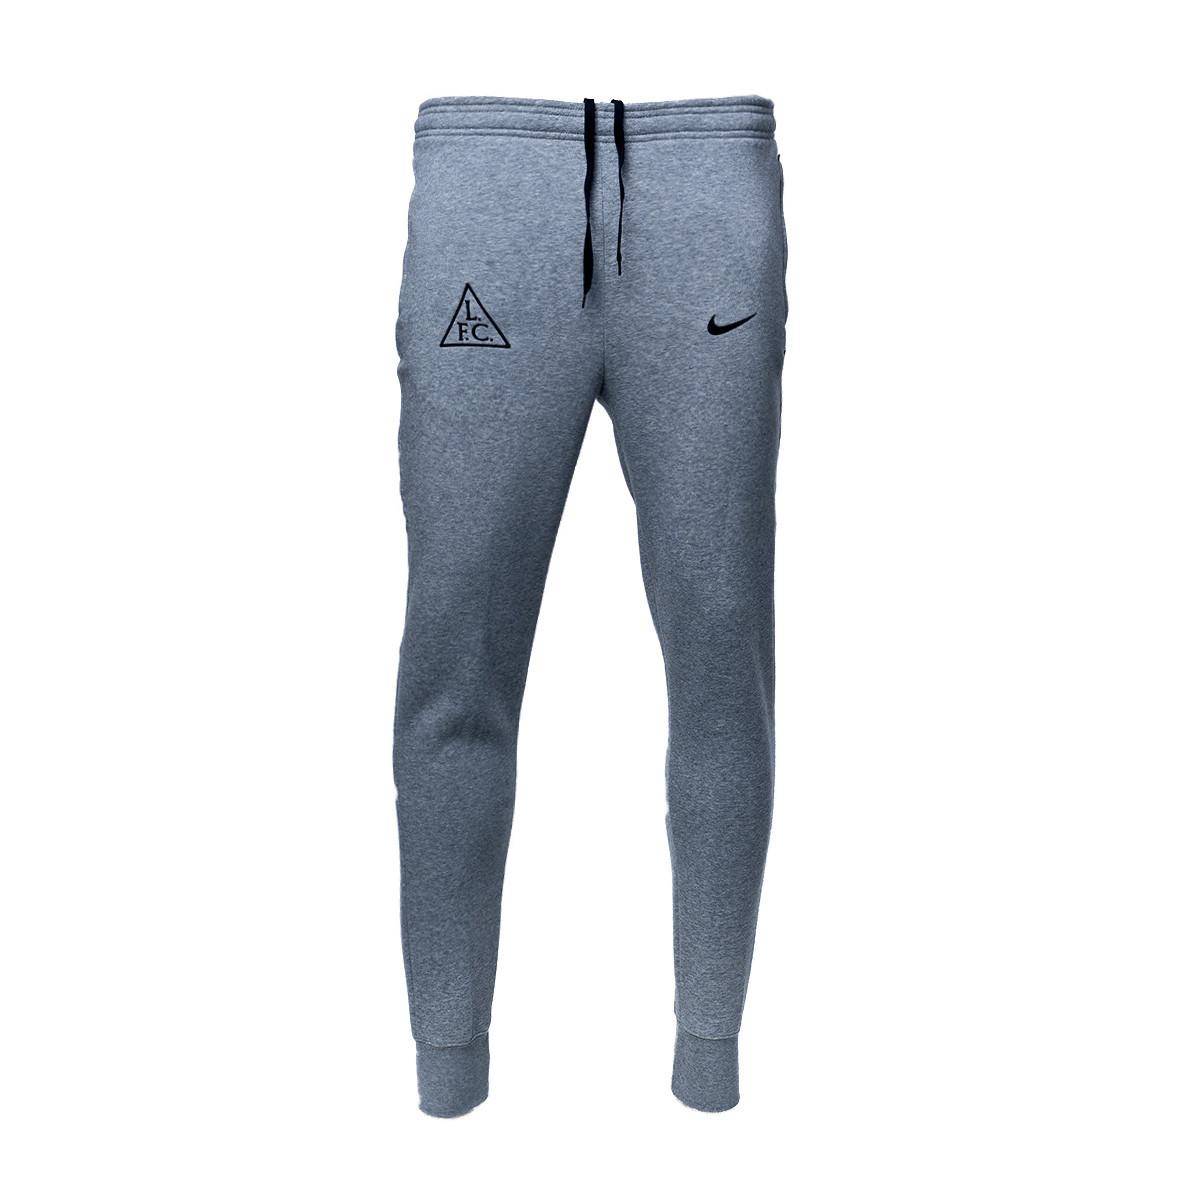 Long Pants Nike Liverpool Fc Gfa Fleece 2020 2021 Dark Grey Heather Black Football Store Futbol Emotion